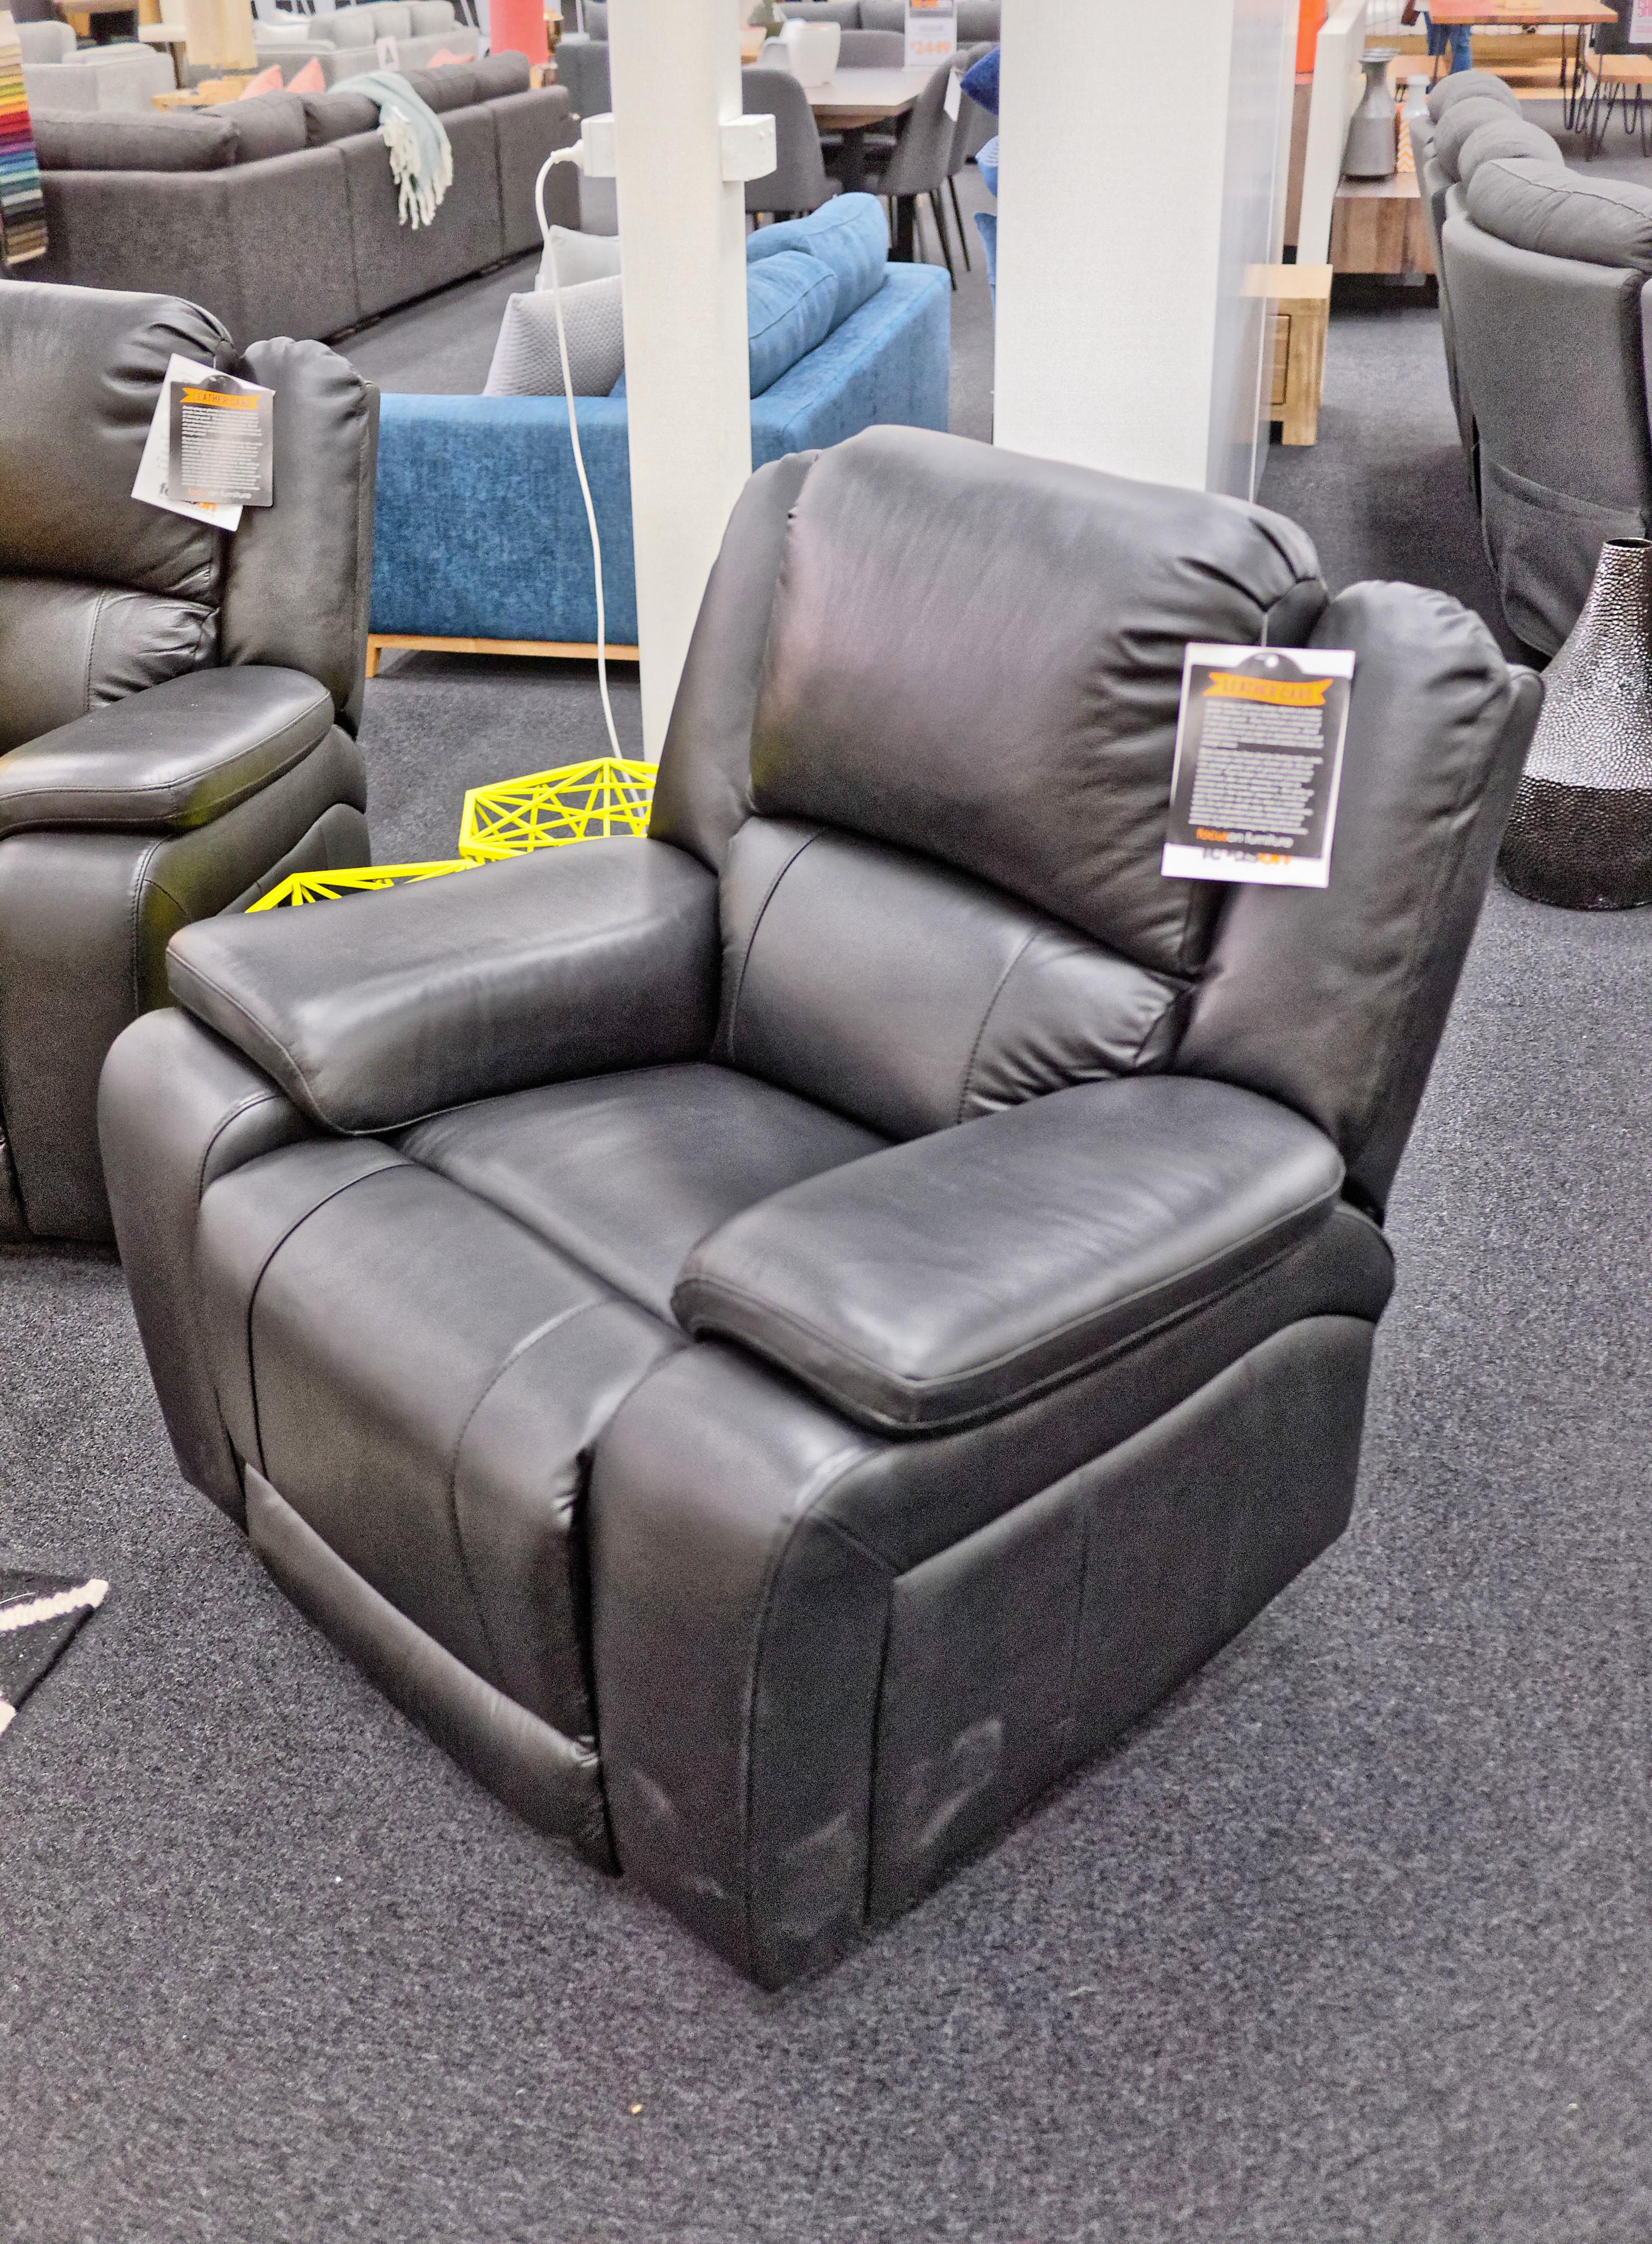 Furniture-5.jpeg